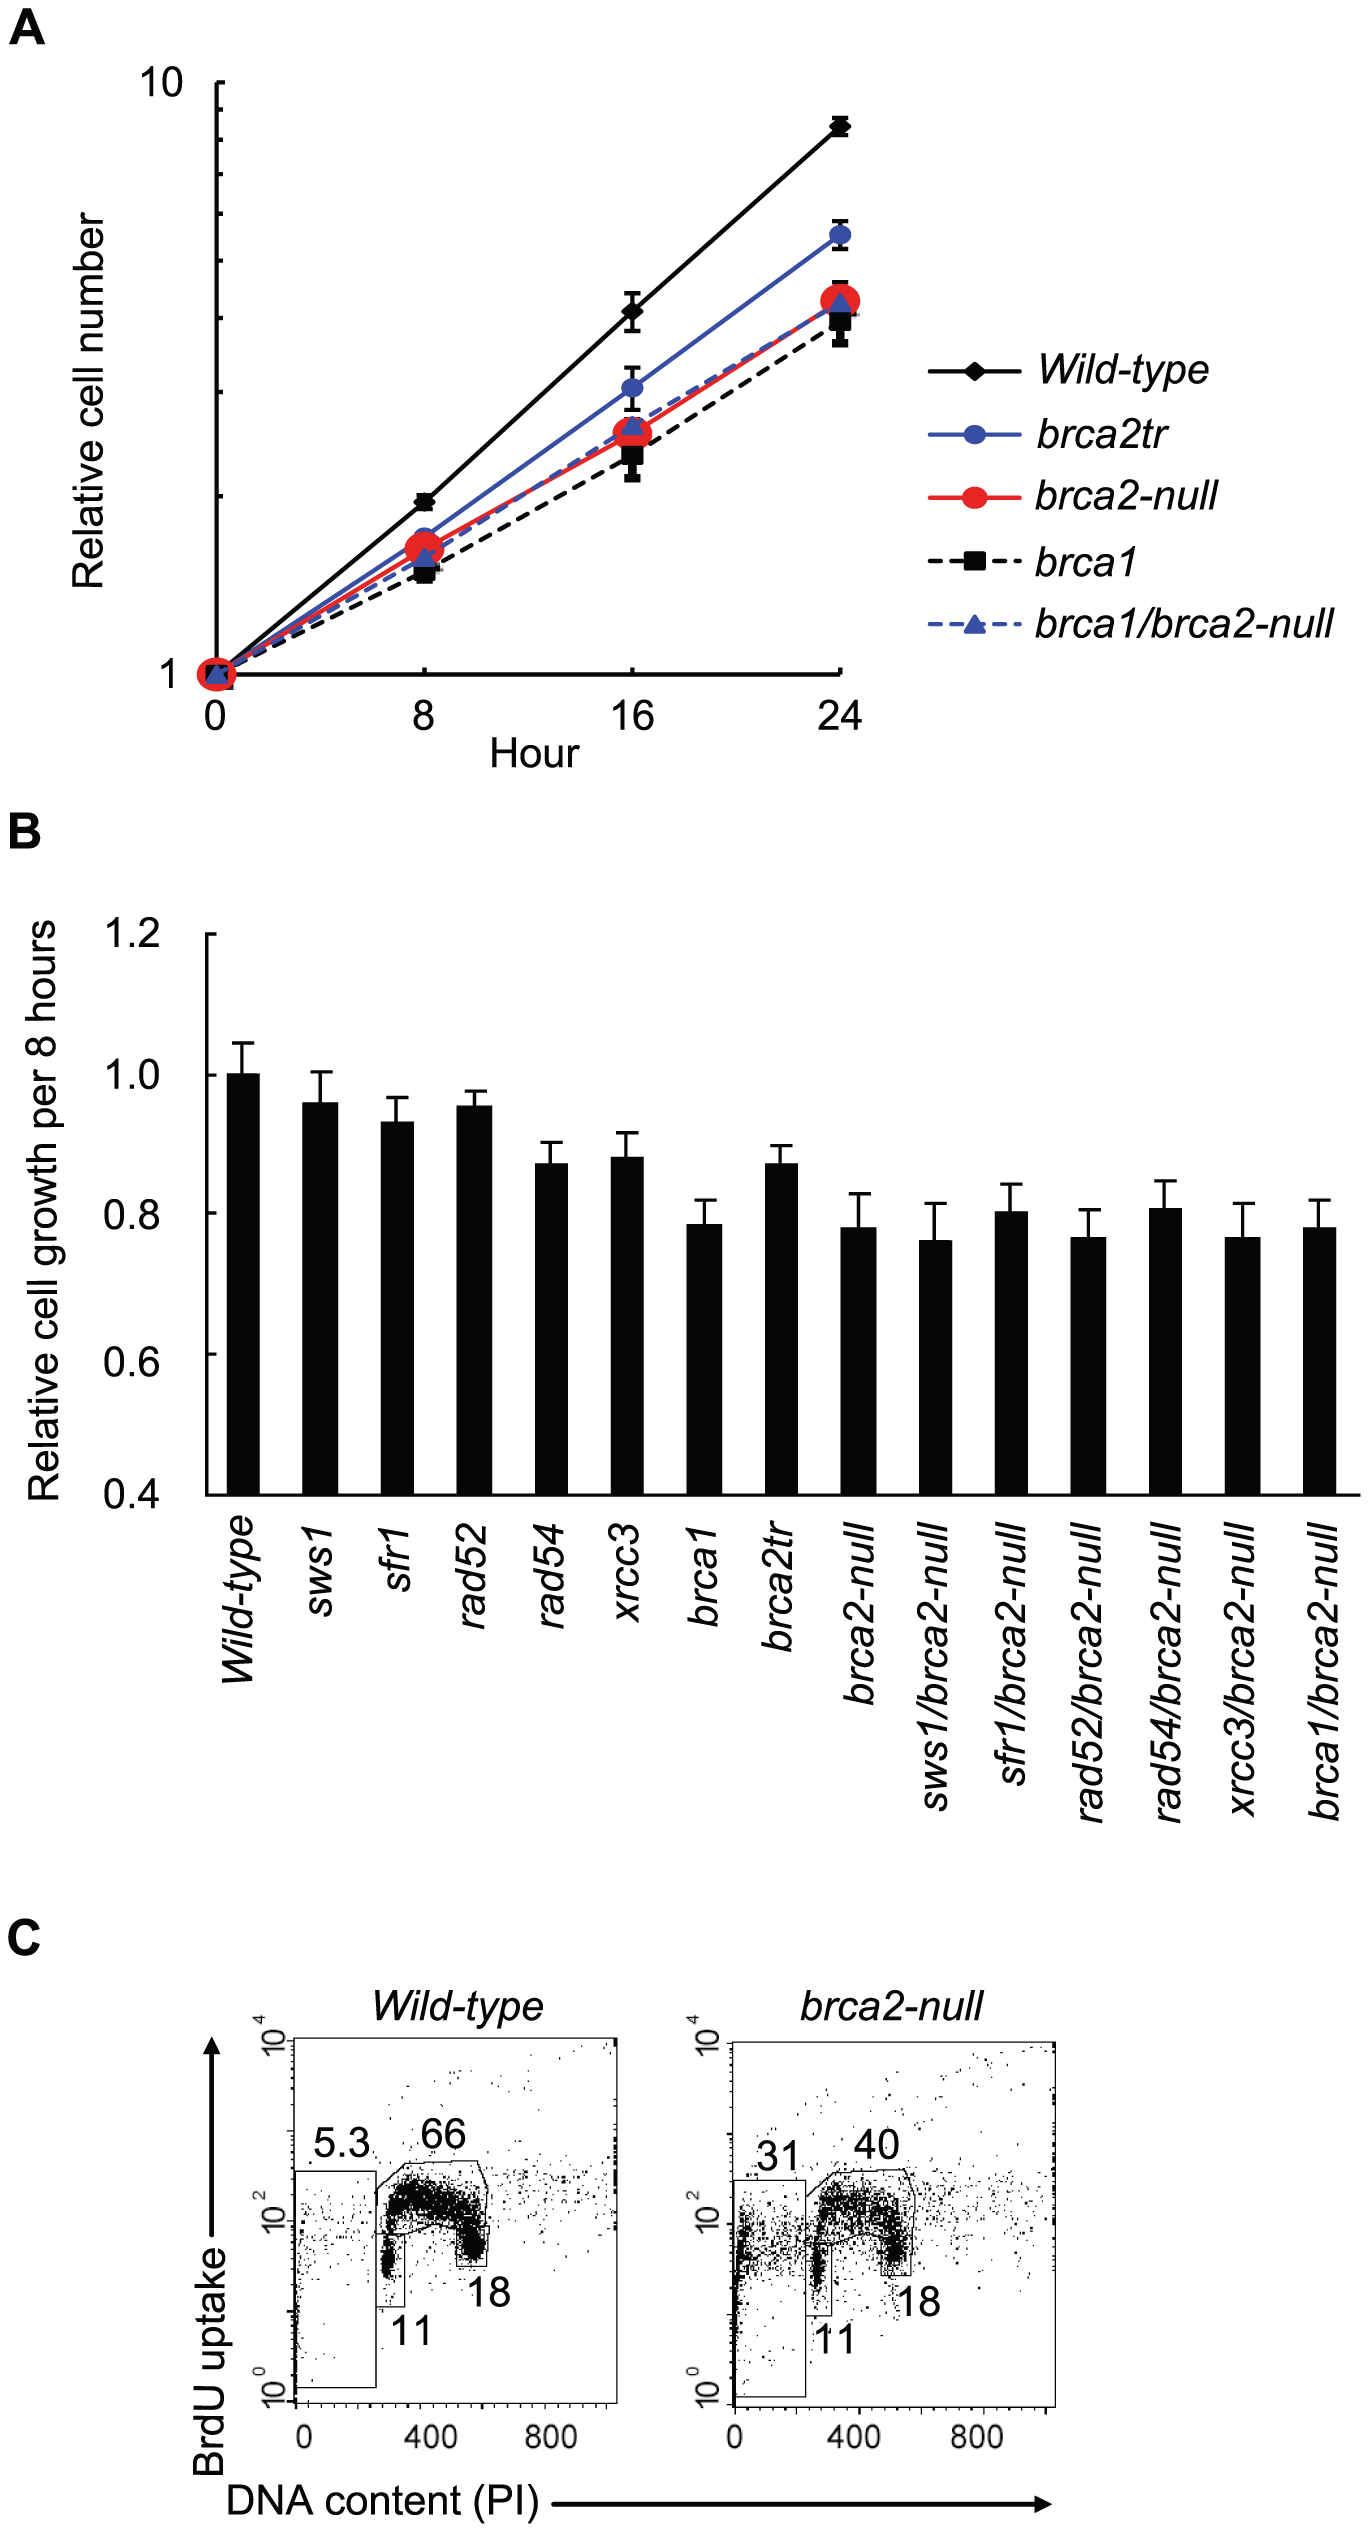 Decreased cellular proliferation in <i>brca2-null</i> cells.